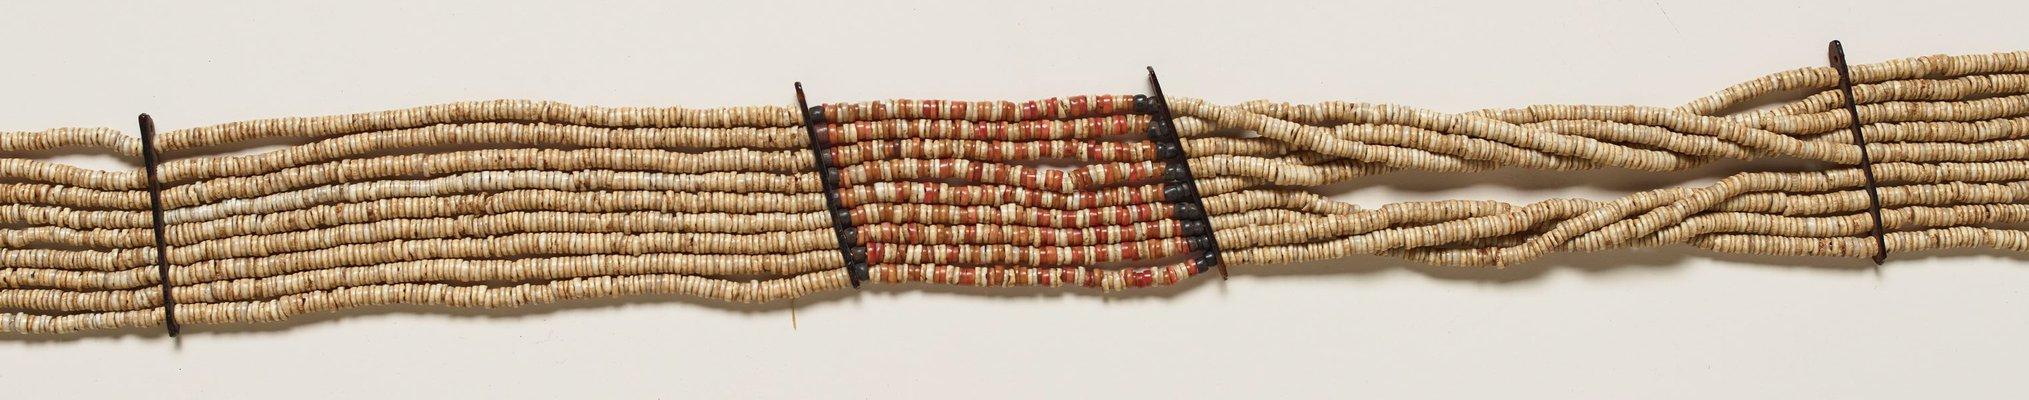 Alternate image of Fo'o'aba (belt) by Langalanga people